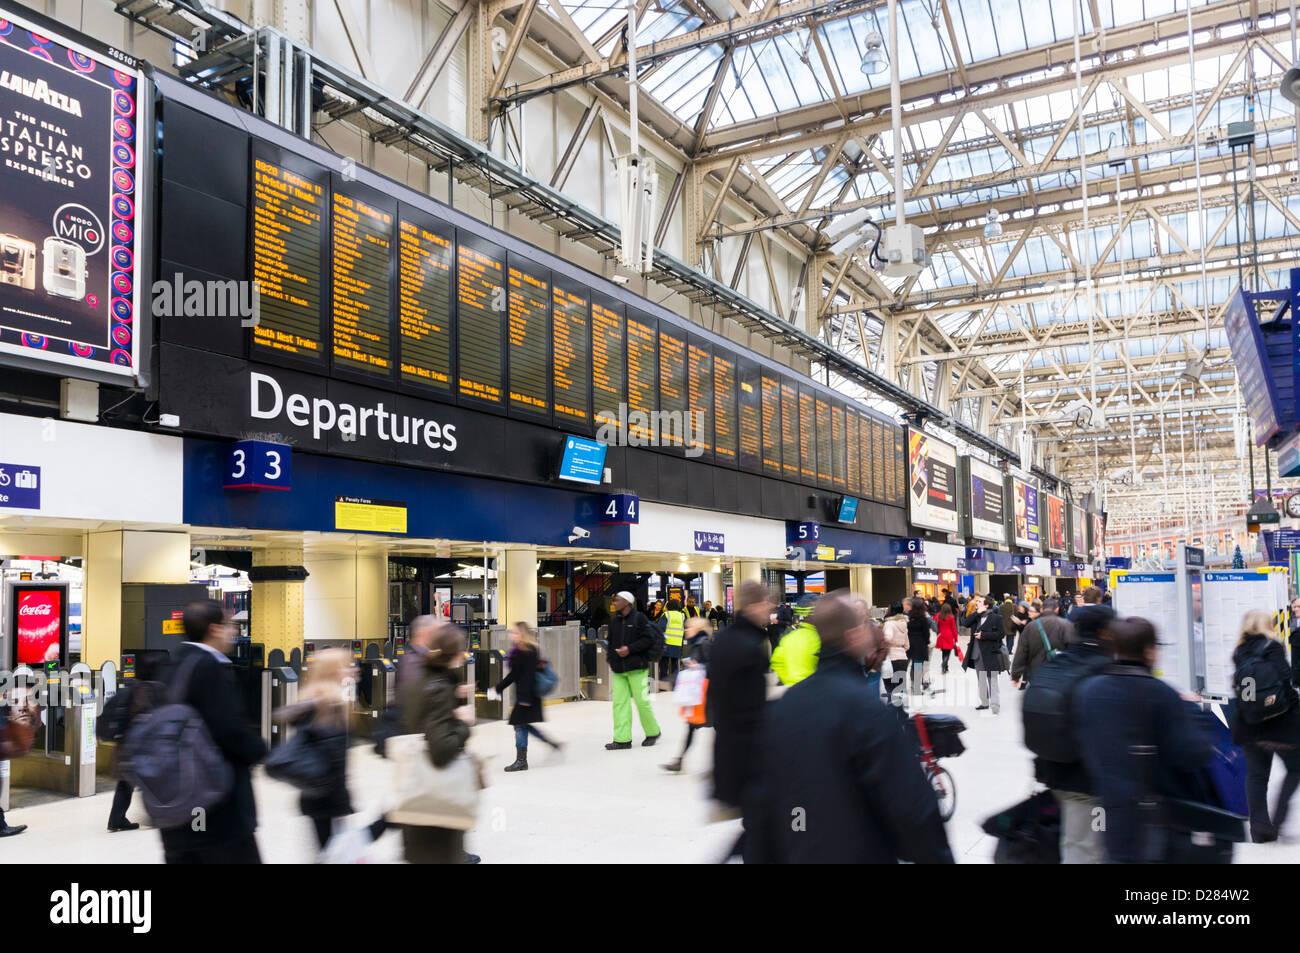 Commuters, passengers, London, England, UK - Waterloo station train station - Stock Image